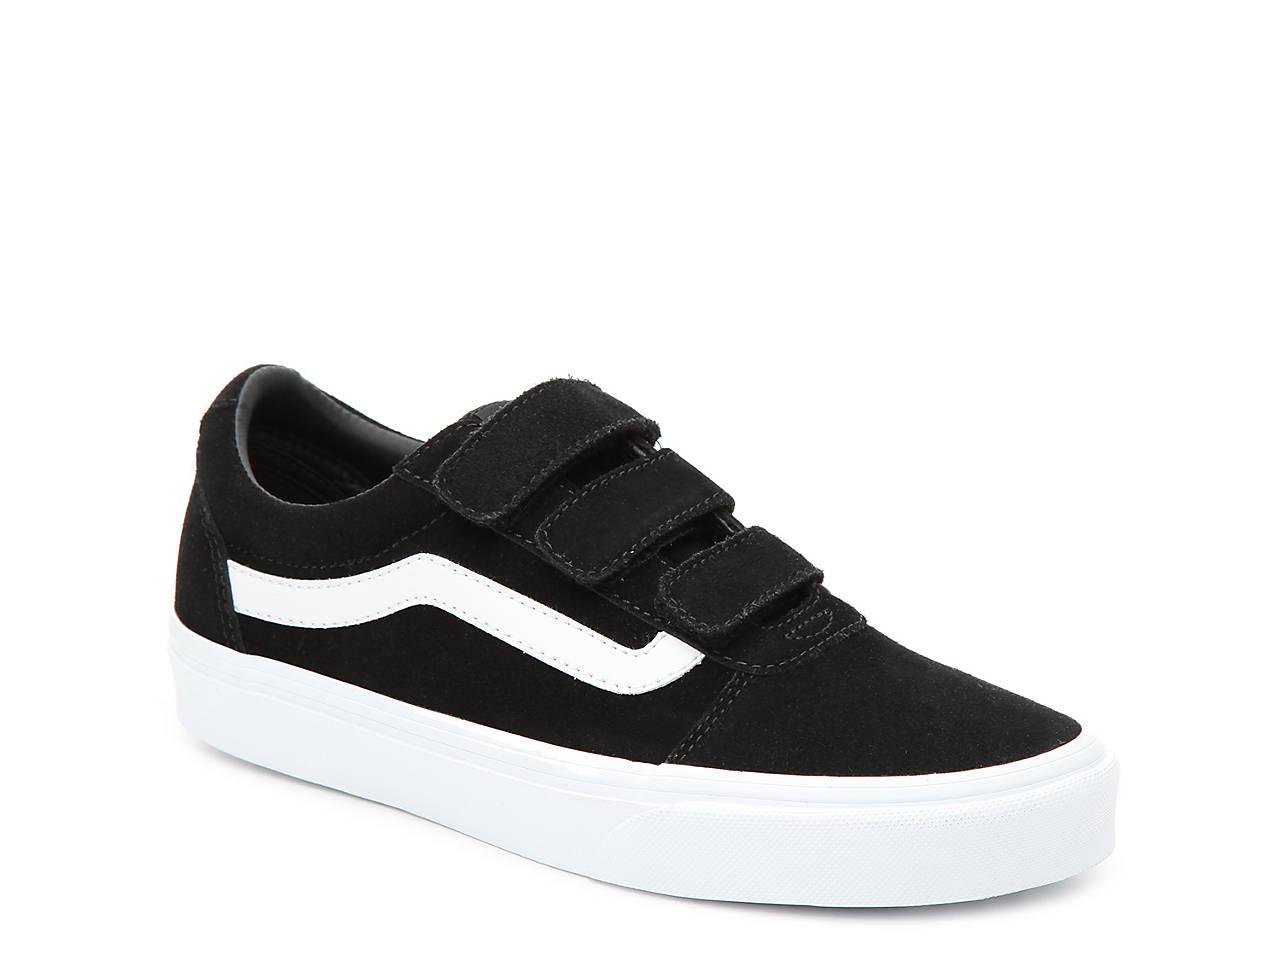 97255ad342 Vans Ward V Sneaker - Women s Women s Shoes